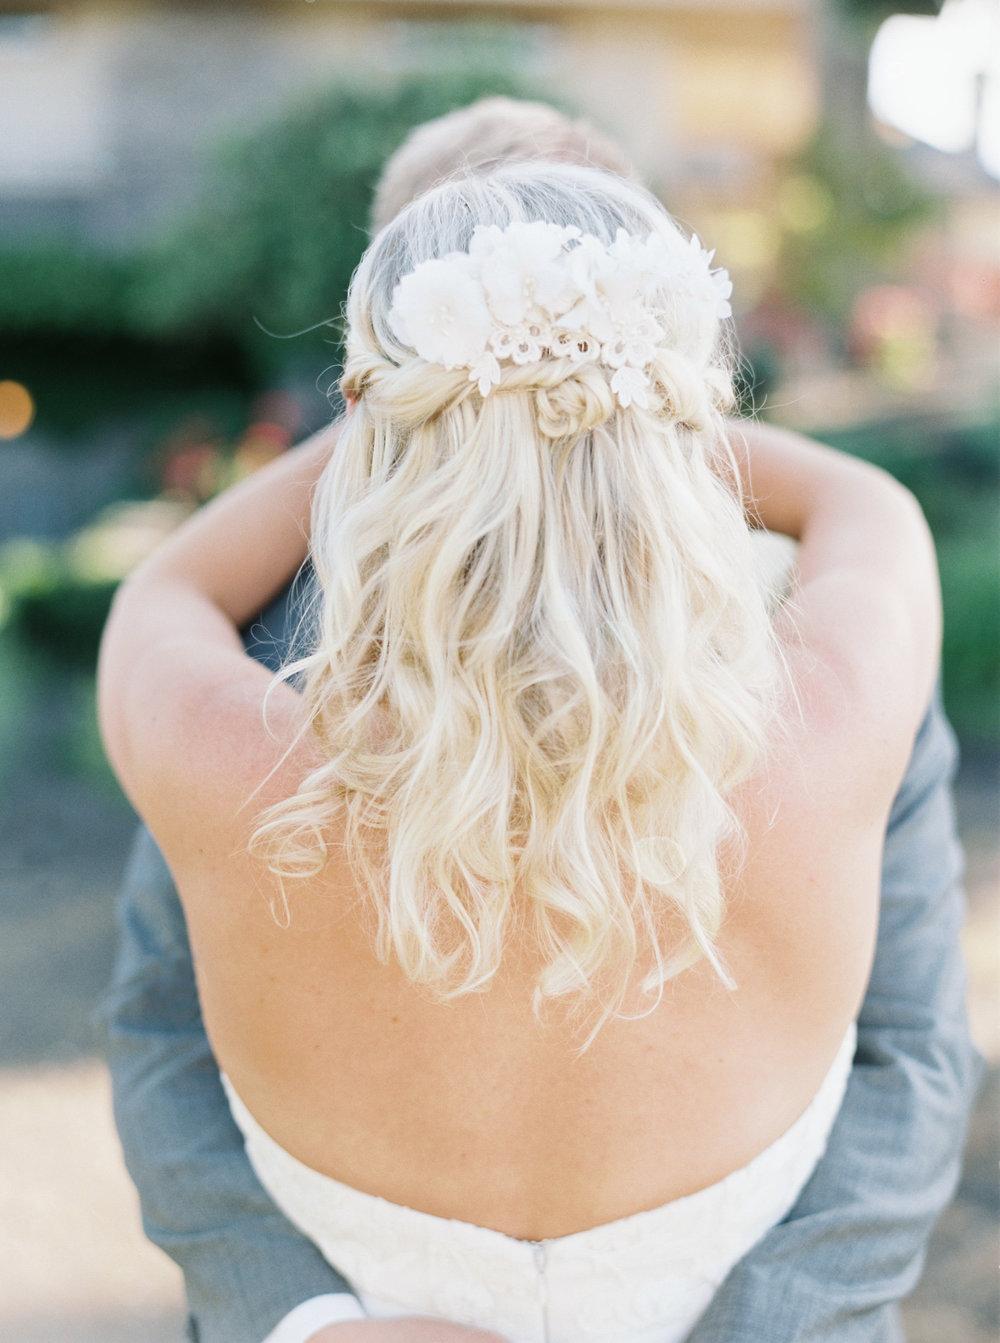 wolfe-heights-event-center-wedding-sacramento-california-wedding-20.jpg